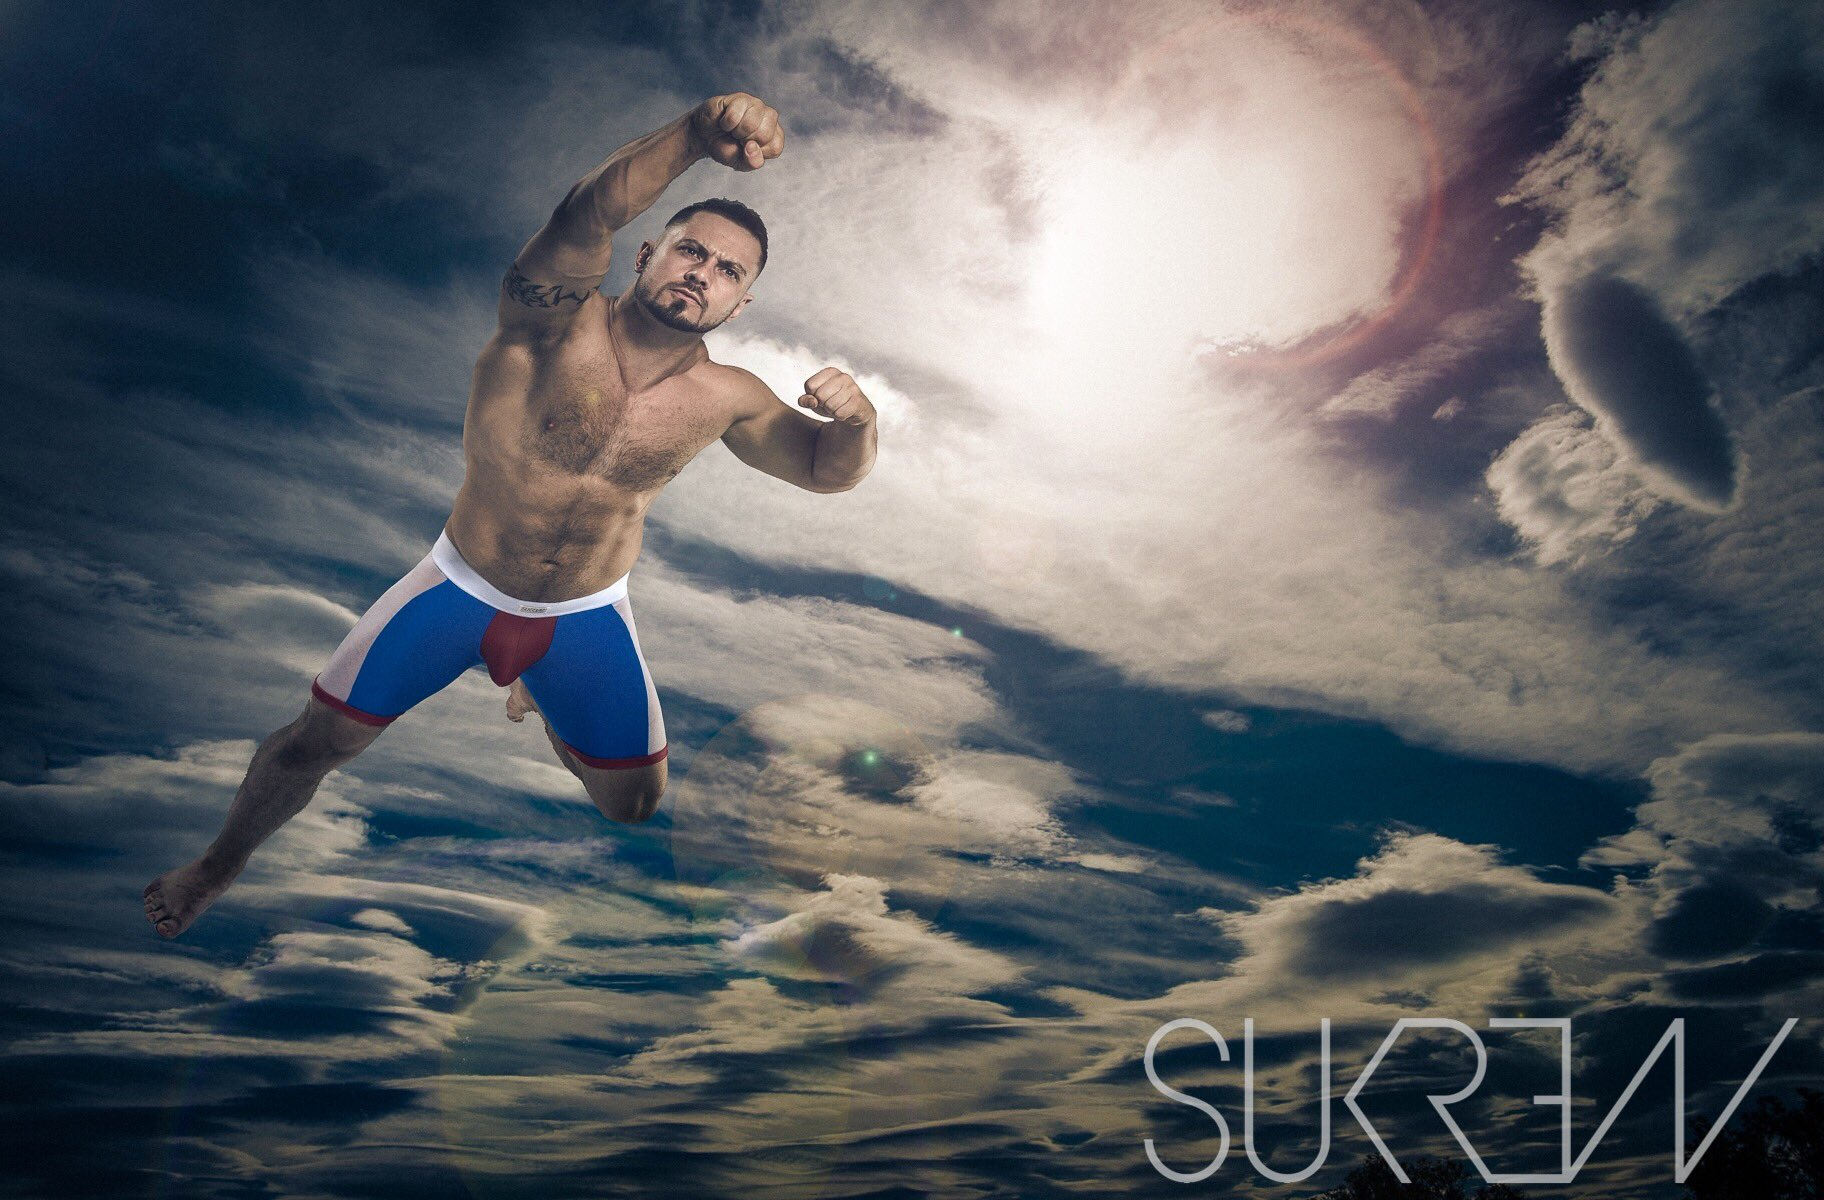 Feel Like a Super Hero in Sukrew's New Hero Sprints